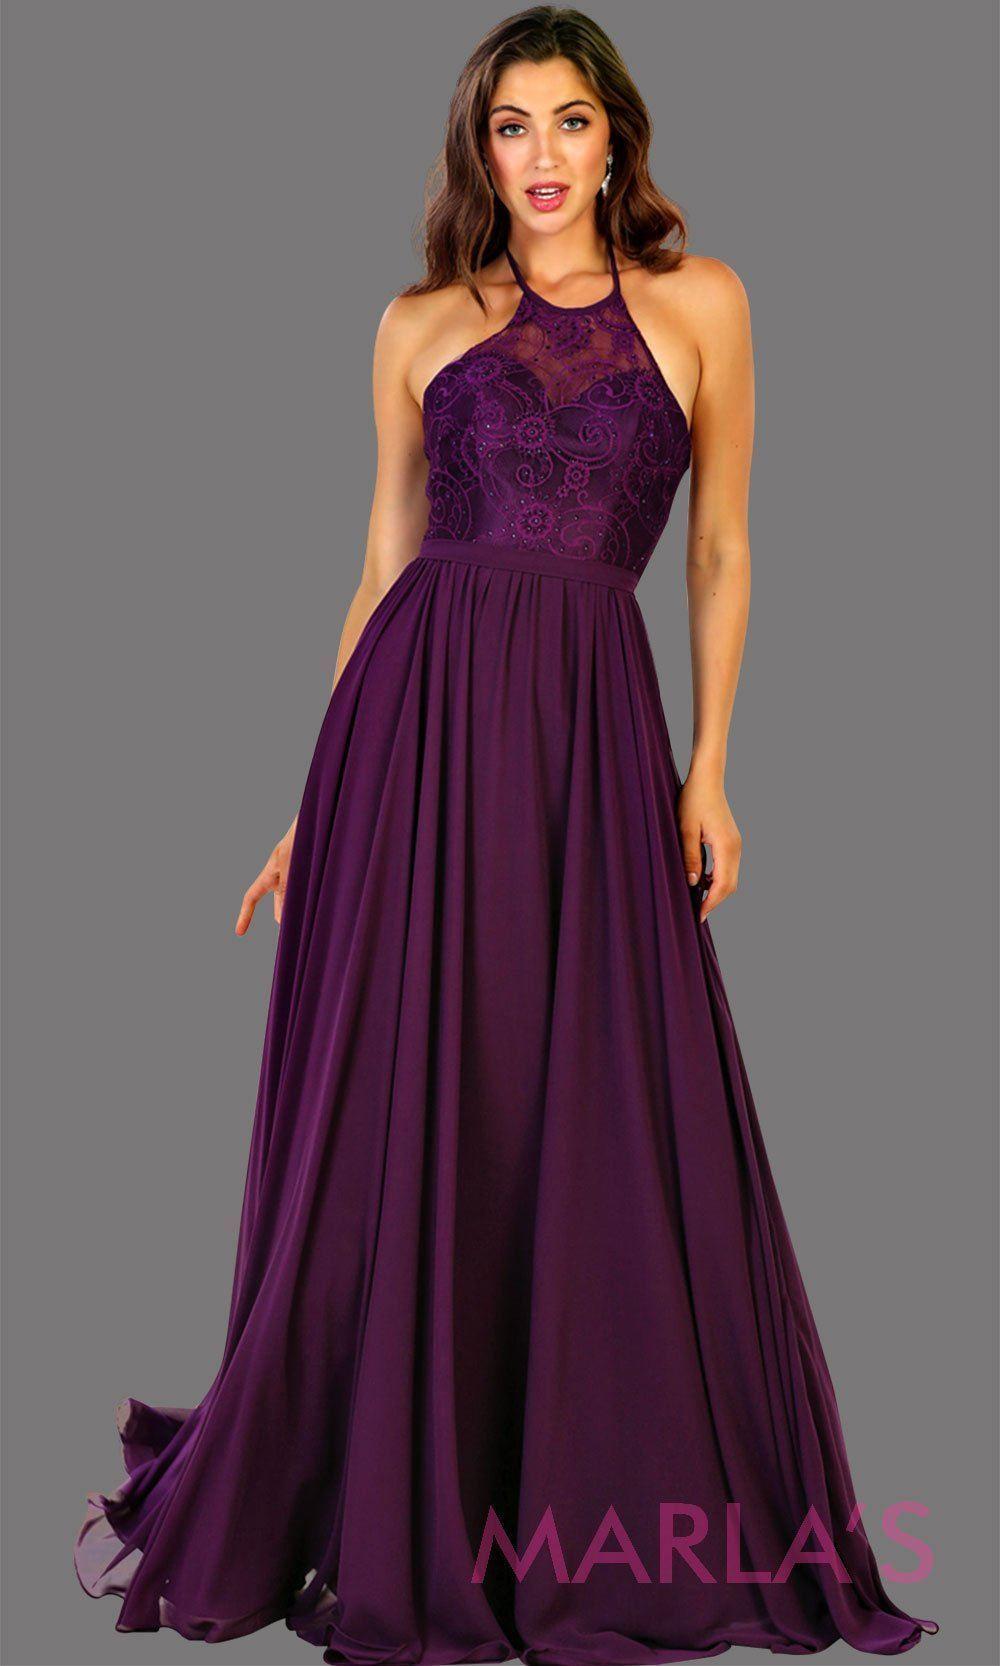 May Queen Mq1507 Louder Than Words Simple Prom Dress Dark Purple Bridesmaid Dresses Long Dark Purple Bridesmaid Dresses [ 1666 x 1000 Pixel ]